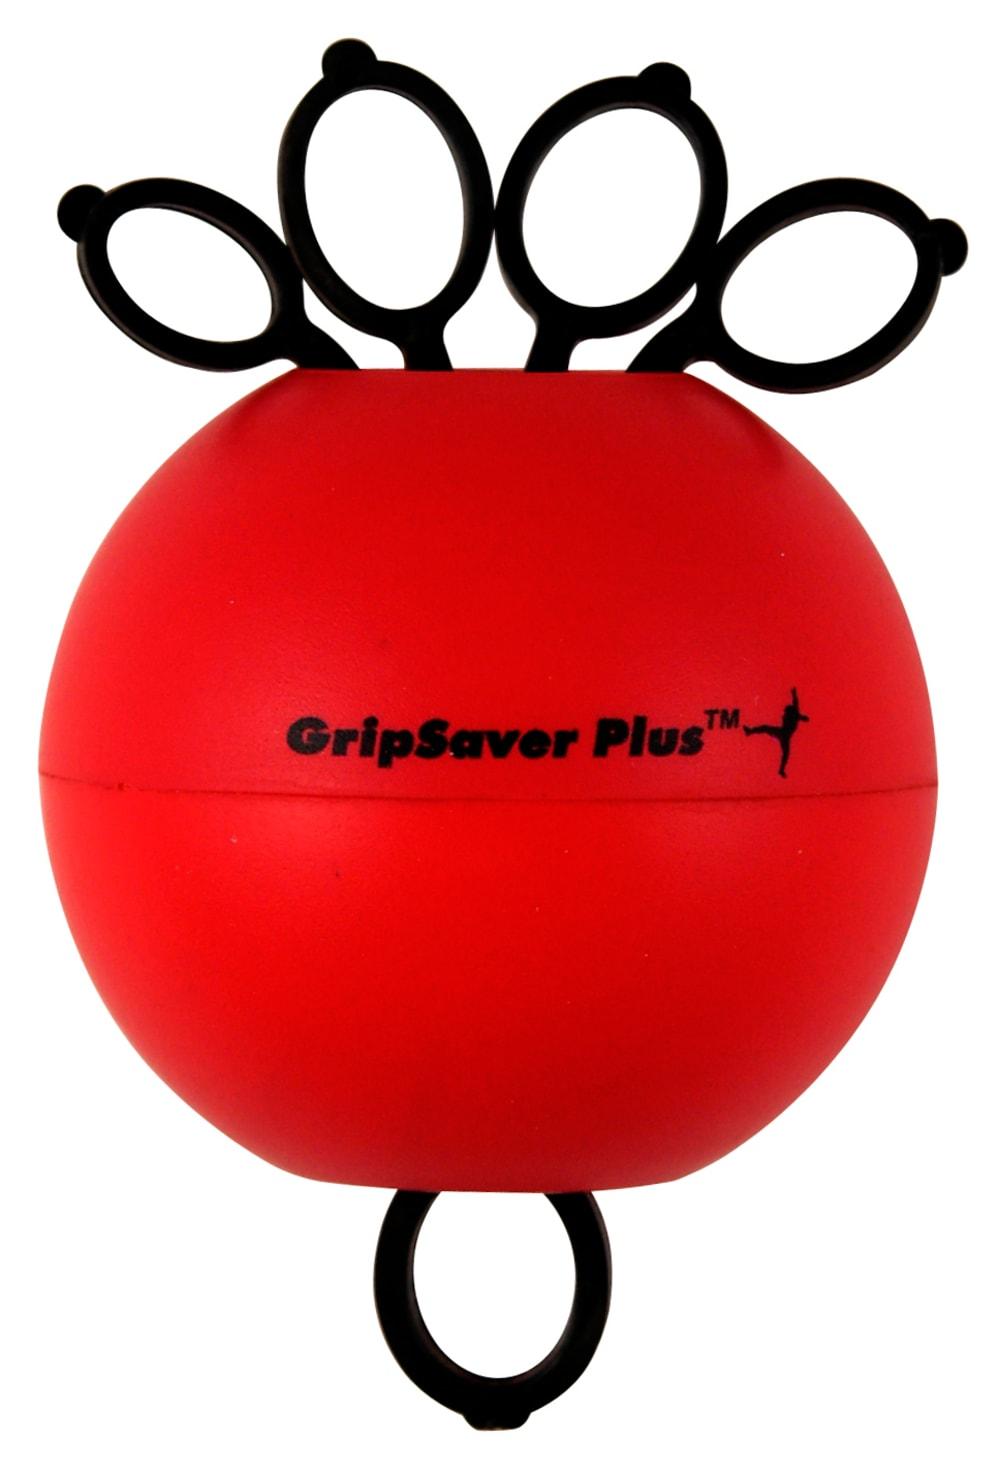 METOLIUS Grip Saver Plus - RED